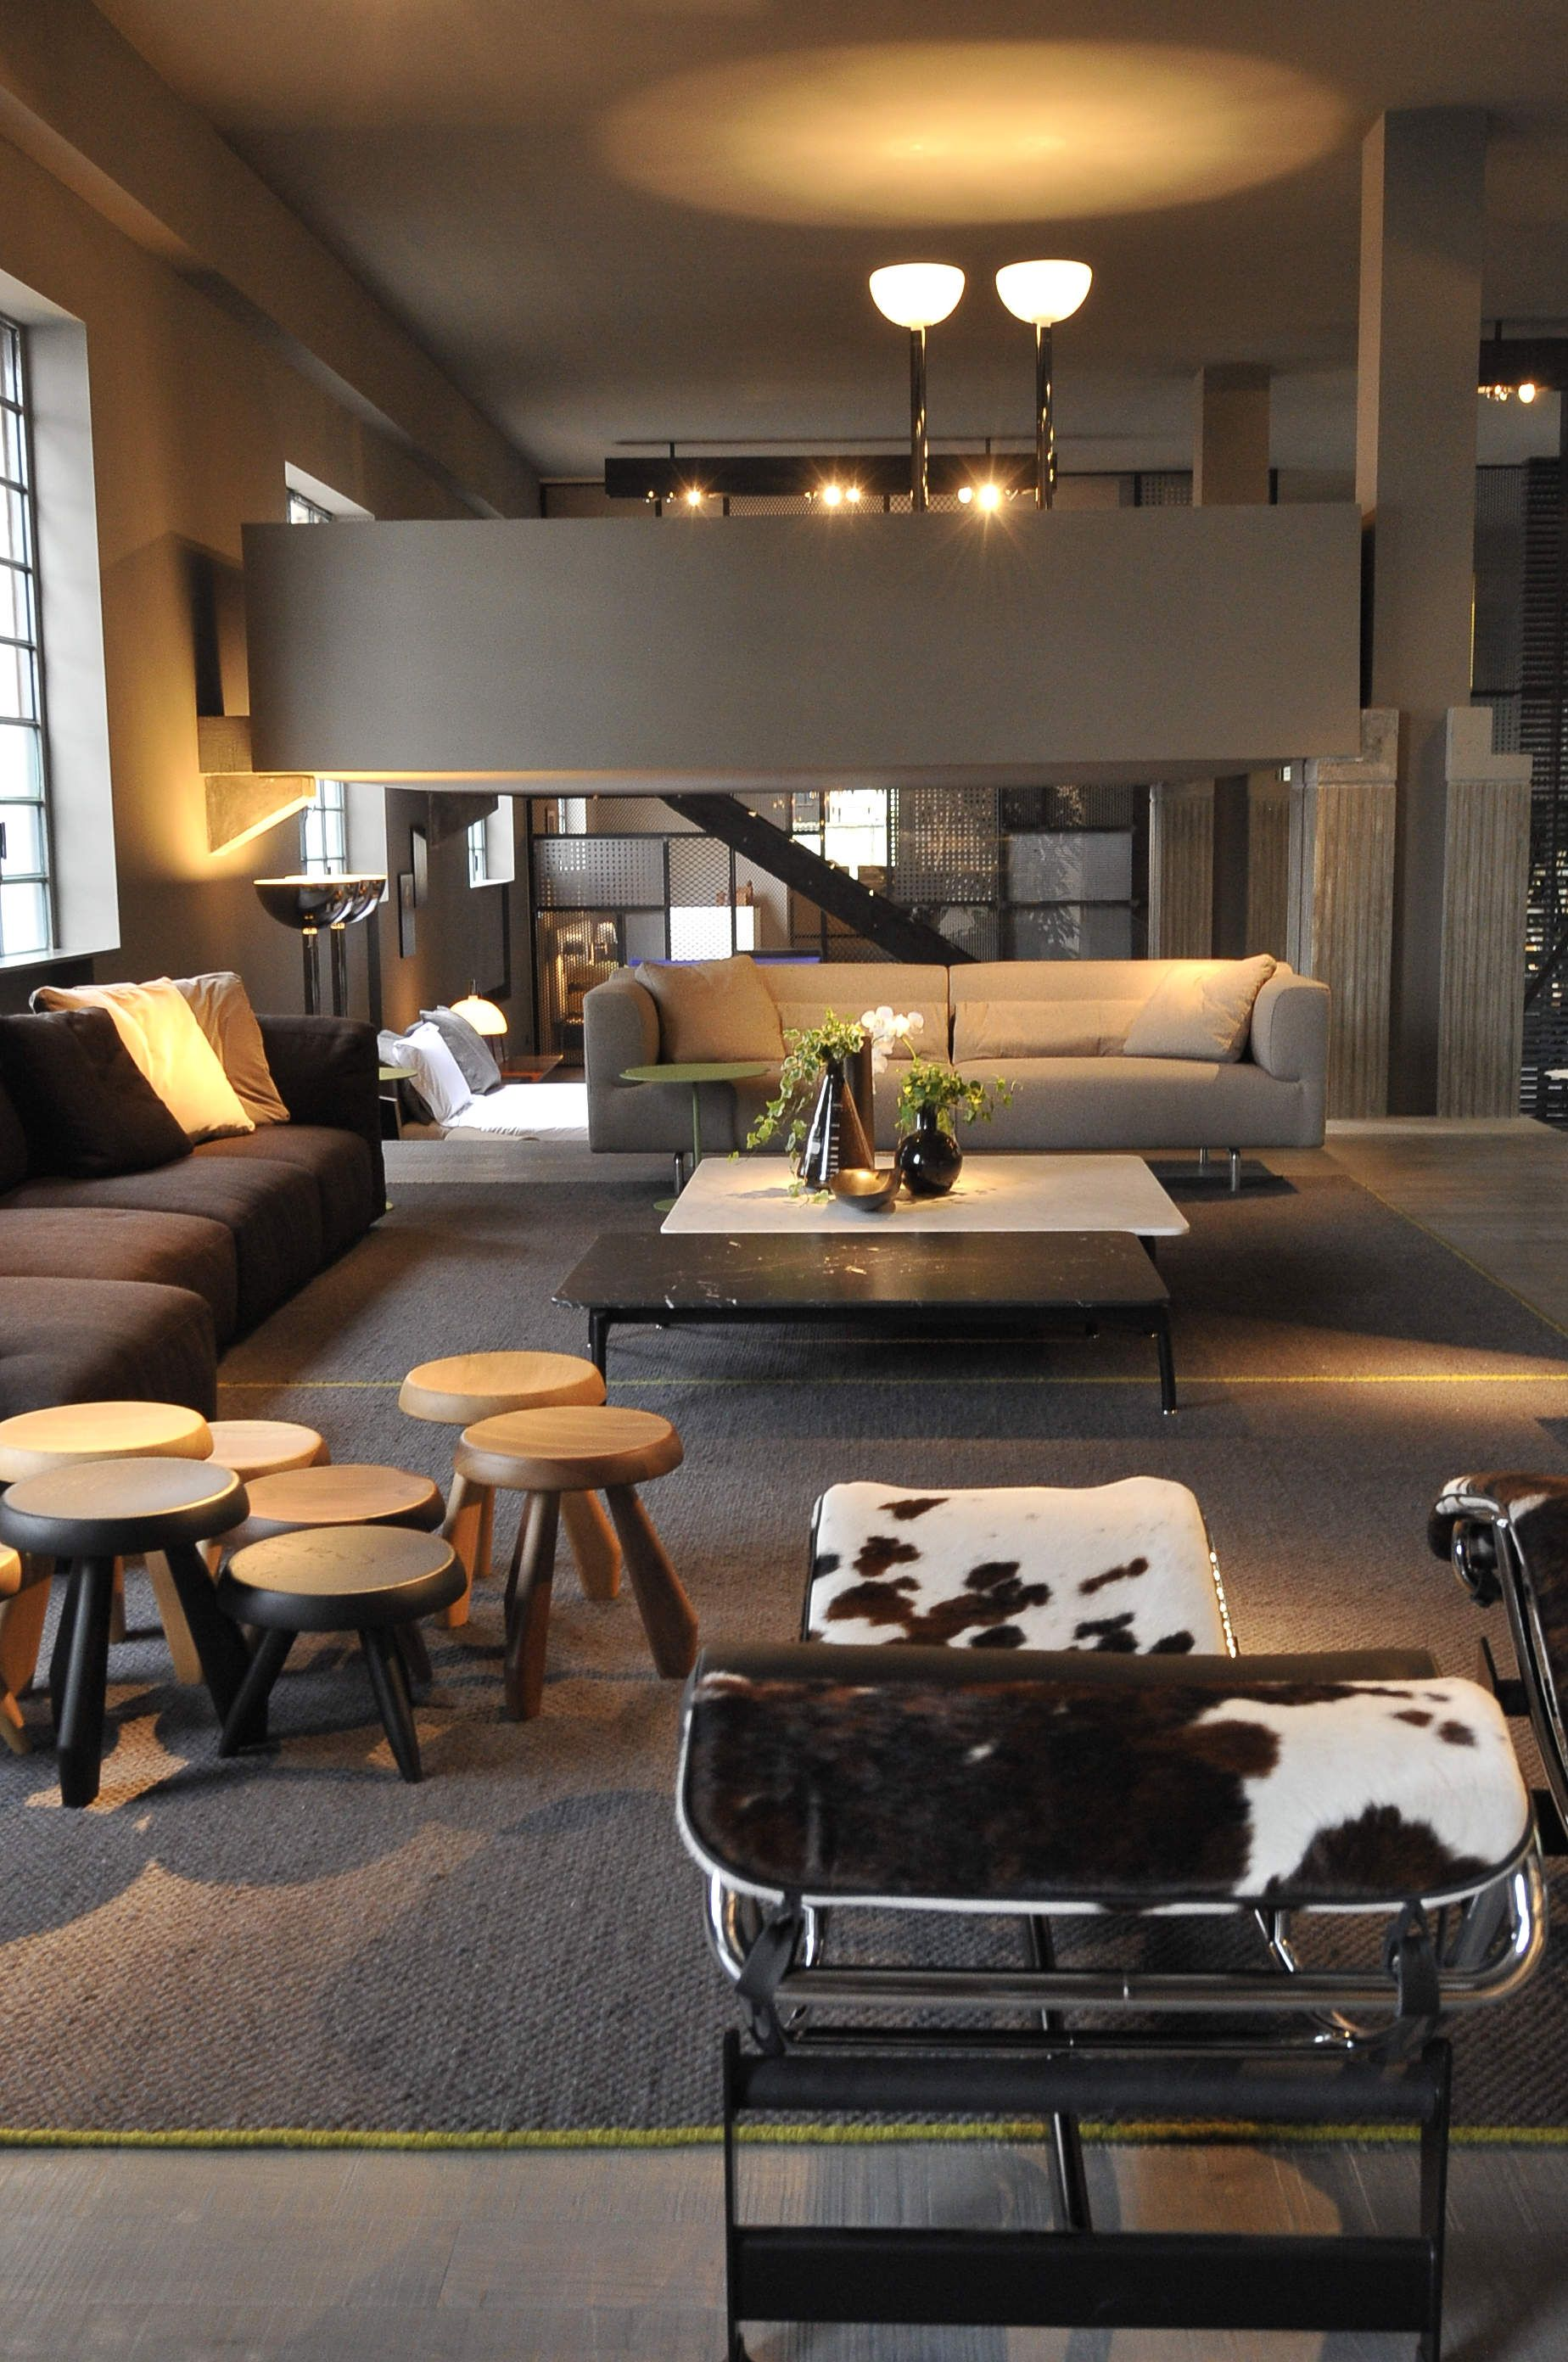 Livingroom cassina r e t a i l s p a c e pinterest for Showroom living room ideas